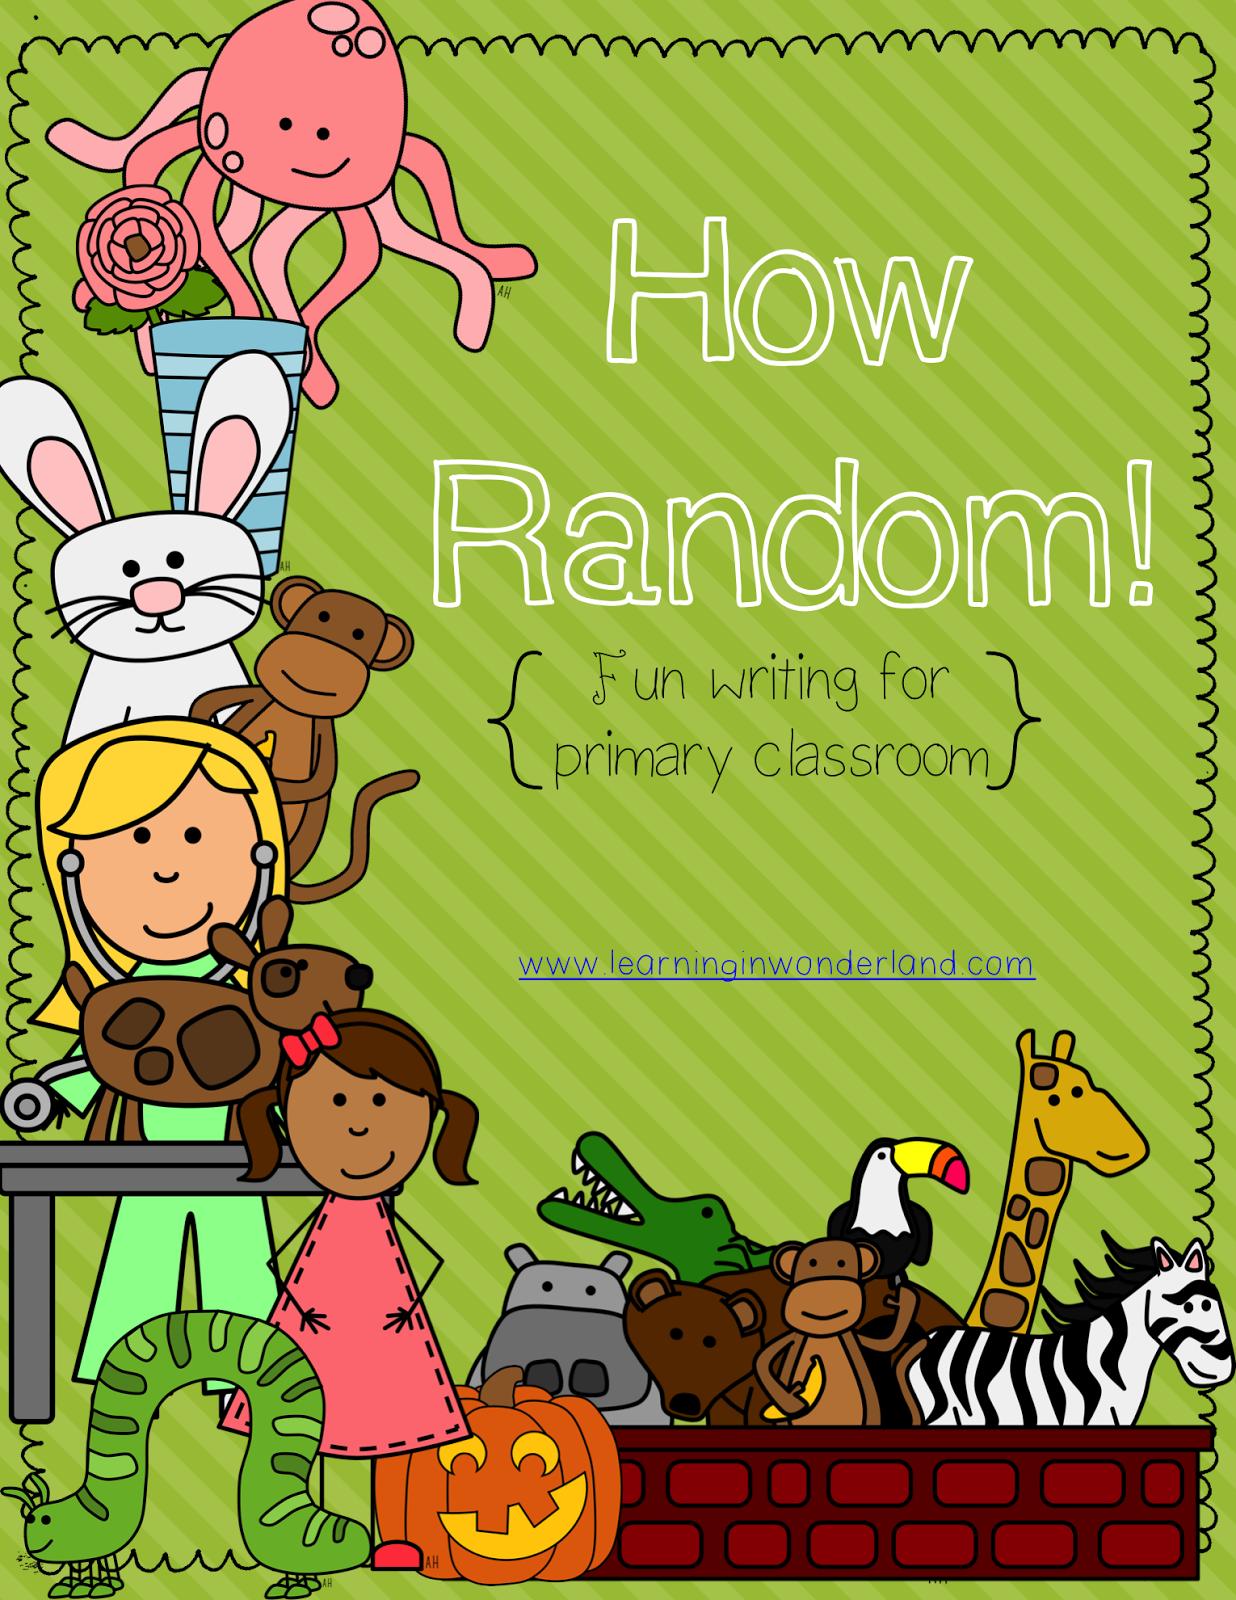 http://www.teacherspayteachers.com/Product/How-Random-Fun-Writing-for-the-Primary-Classroom--924509